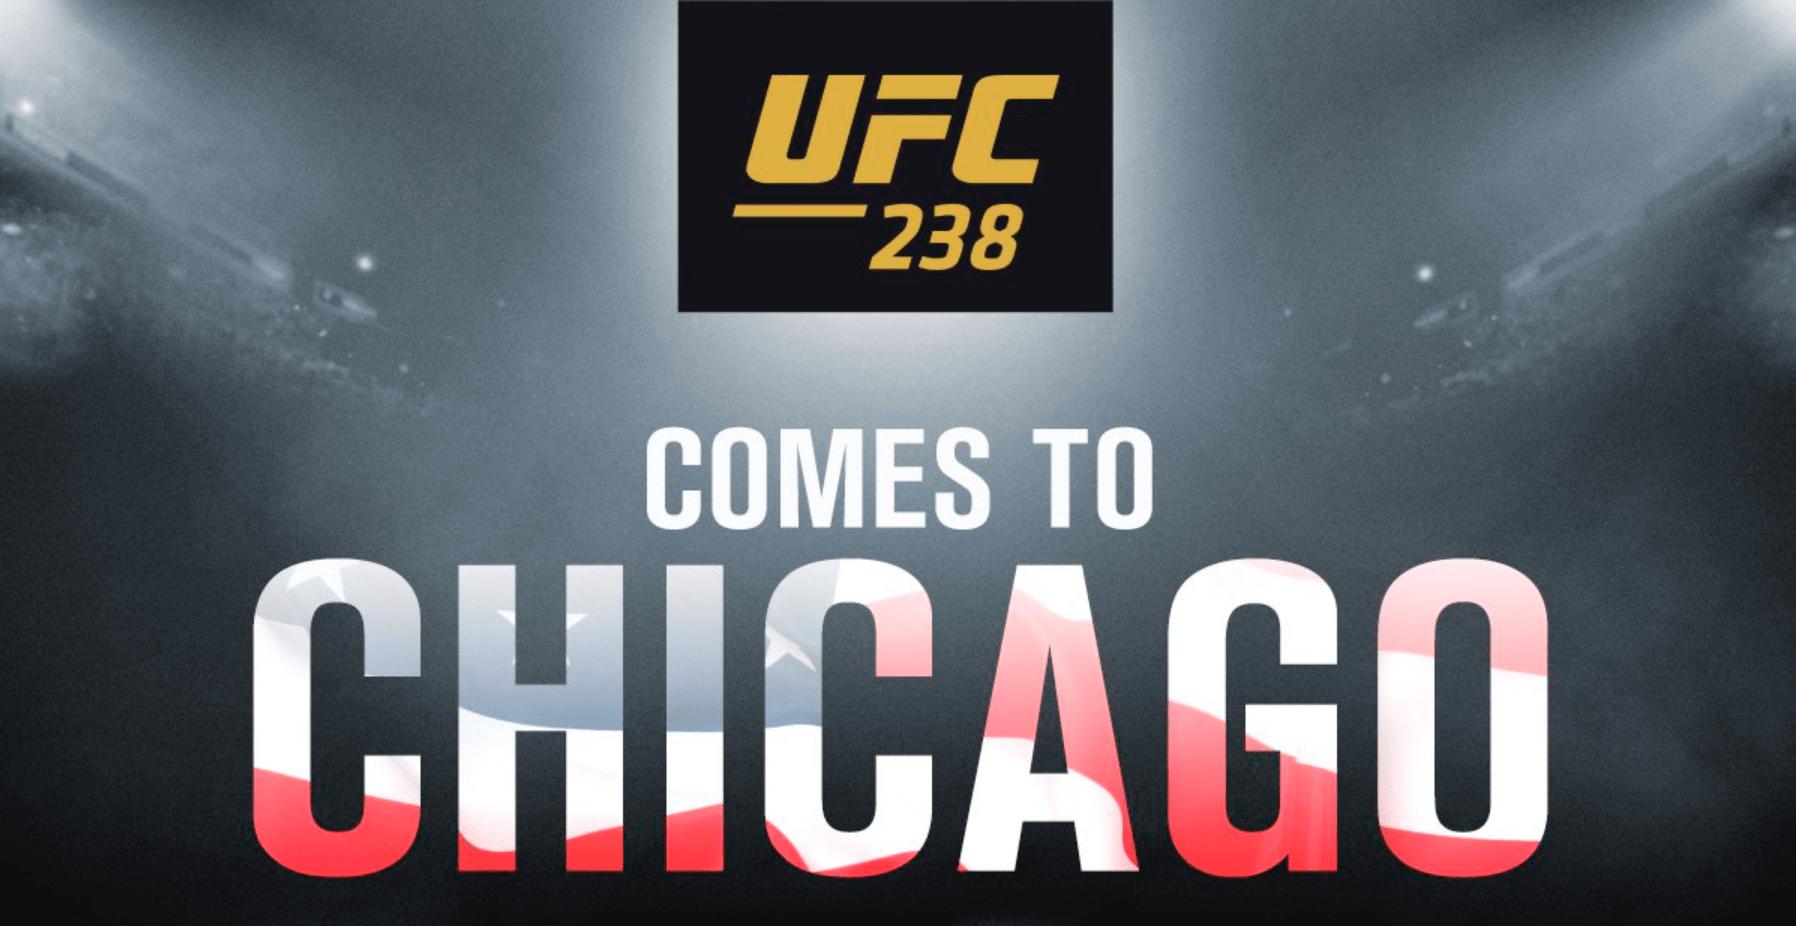 UFC 238 Heading To Chicago